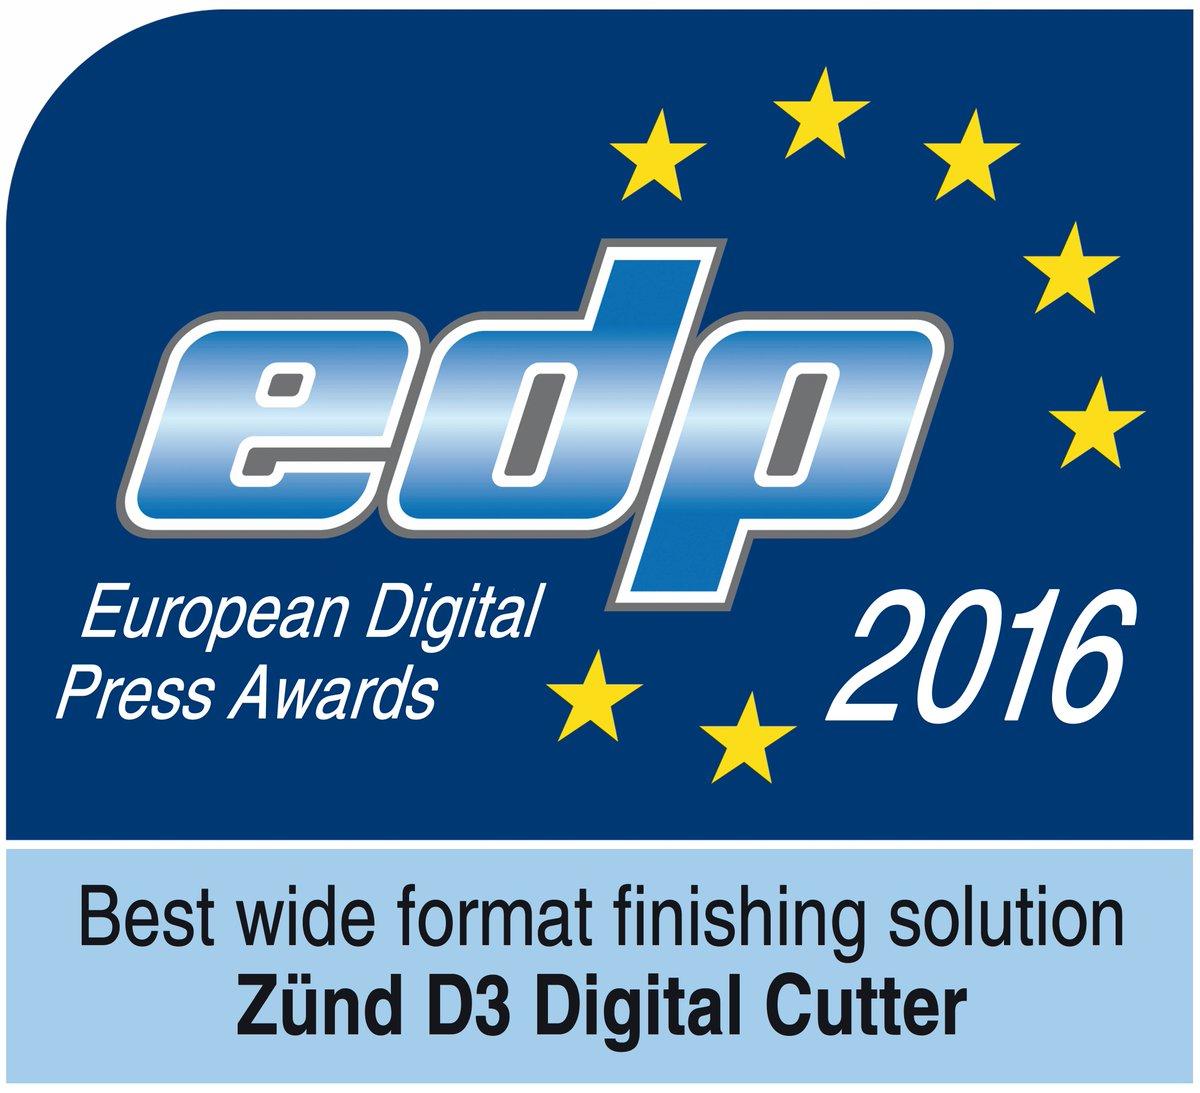 "#doubleyourproductivity ""Best wide format finishing device Zünd D3"" #proud #drupa2016 #zundcutter #edp_award https://t.co/fiOOgtRpJa"